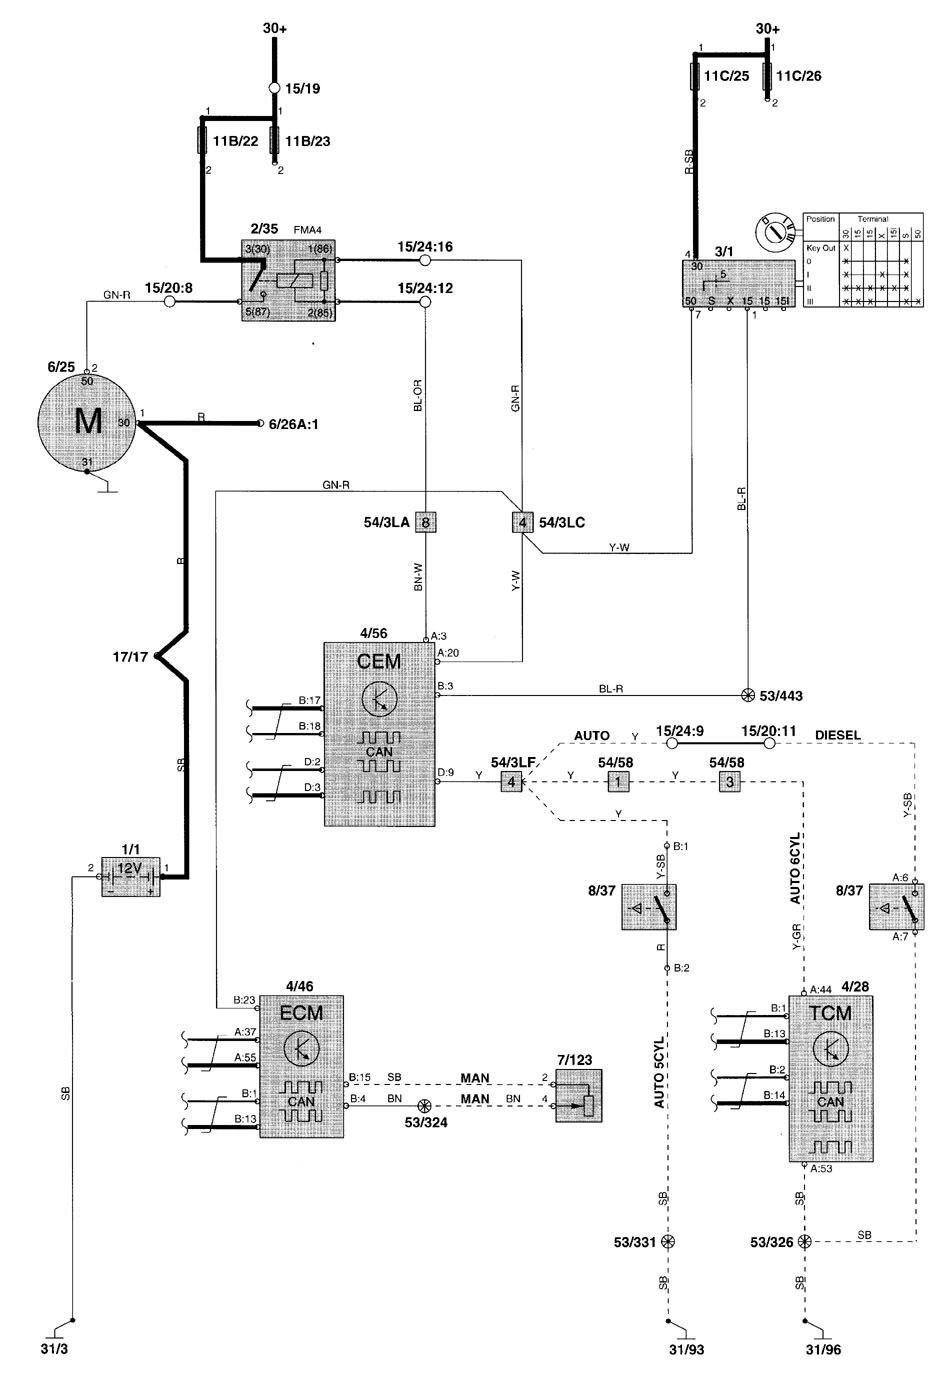 medium resolution of volvo v70 2001 wiring diagrams starting carknowledge volvo v70 engine diagram 2001 volvo v70 wiring diagram pdf